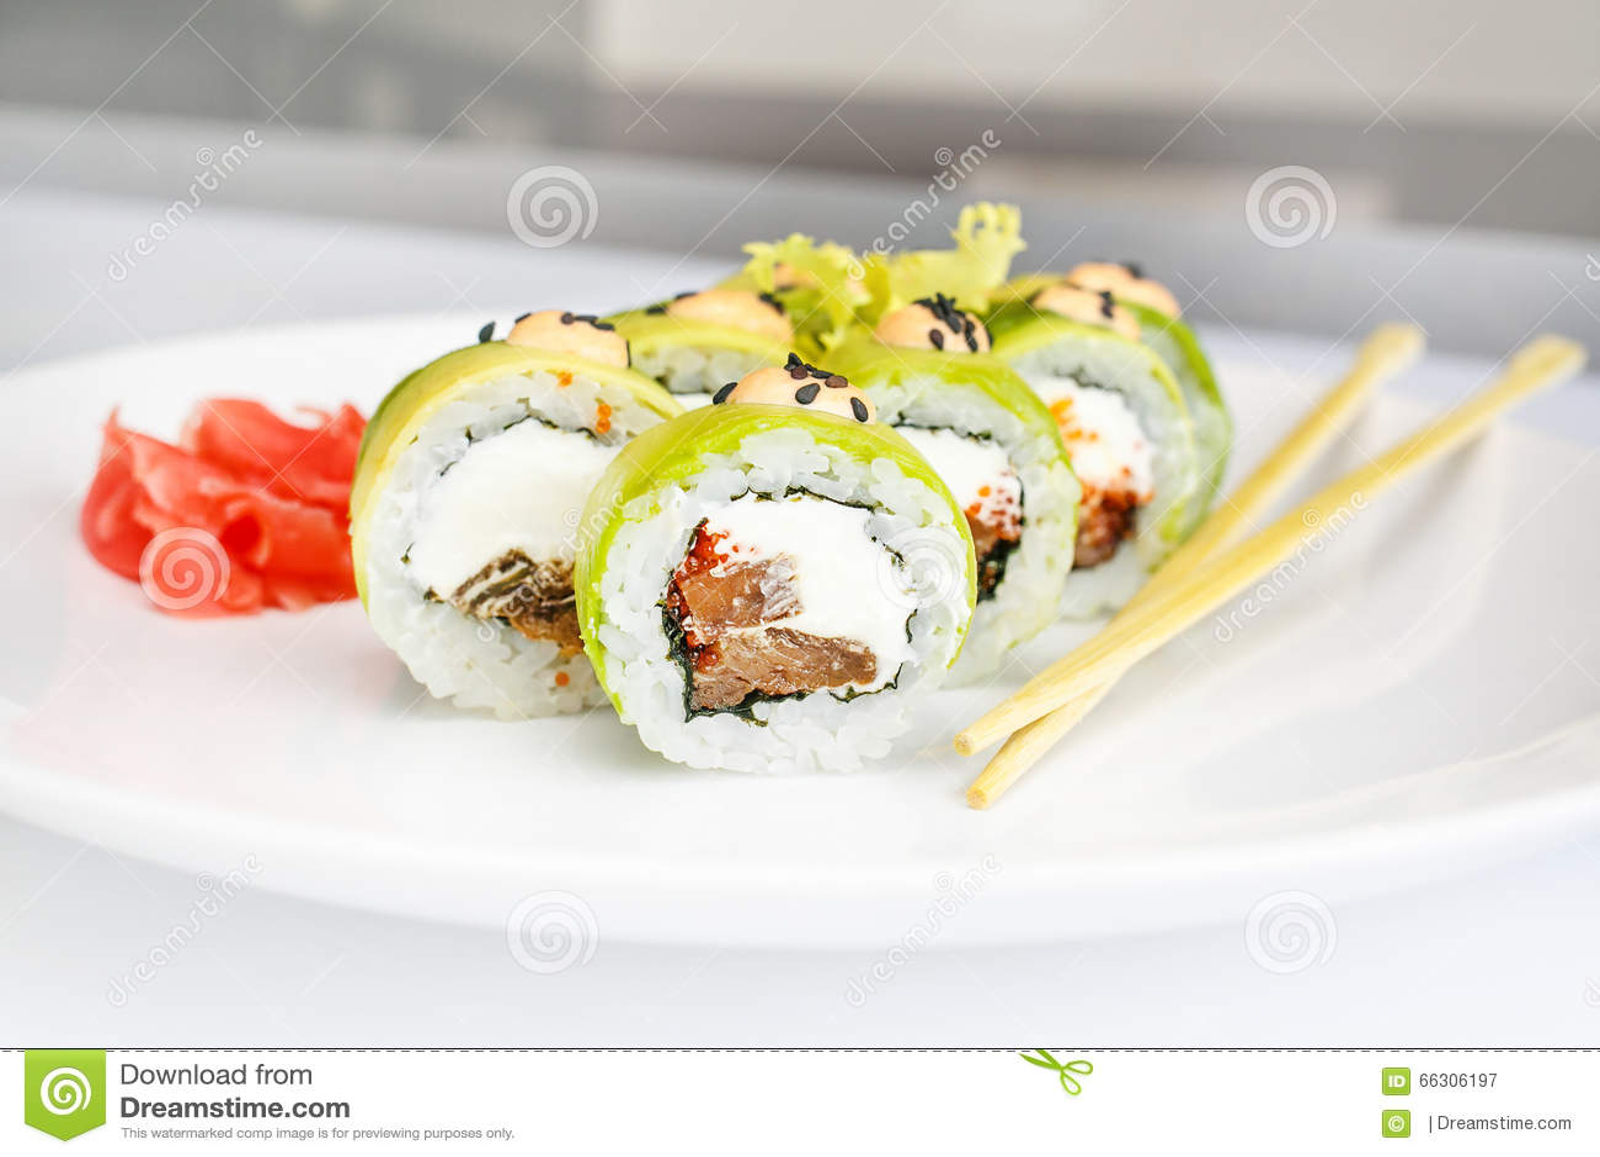 Japanse zeevruchtensushi, broodje en eetstokje op een witte plaat